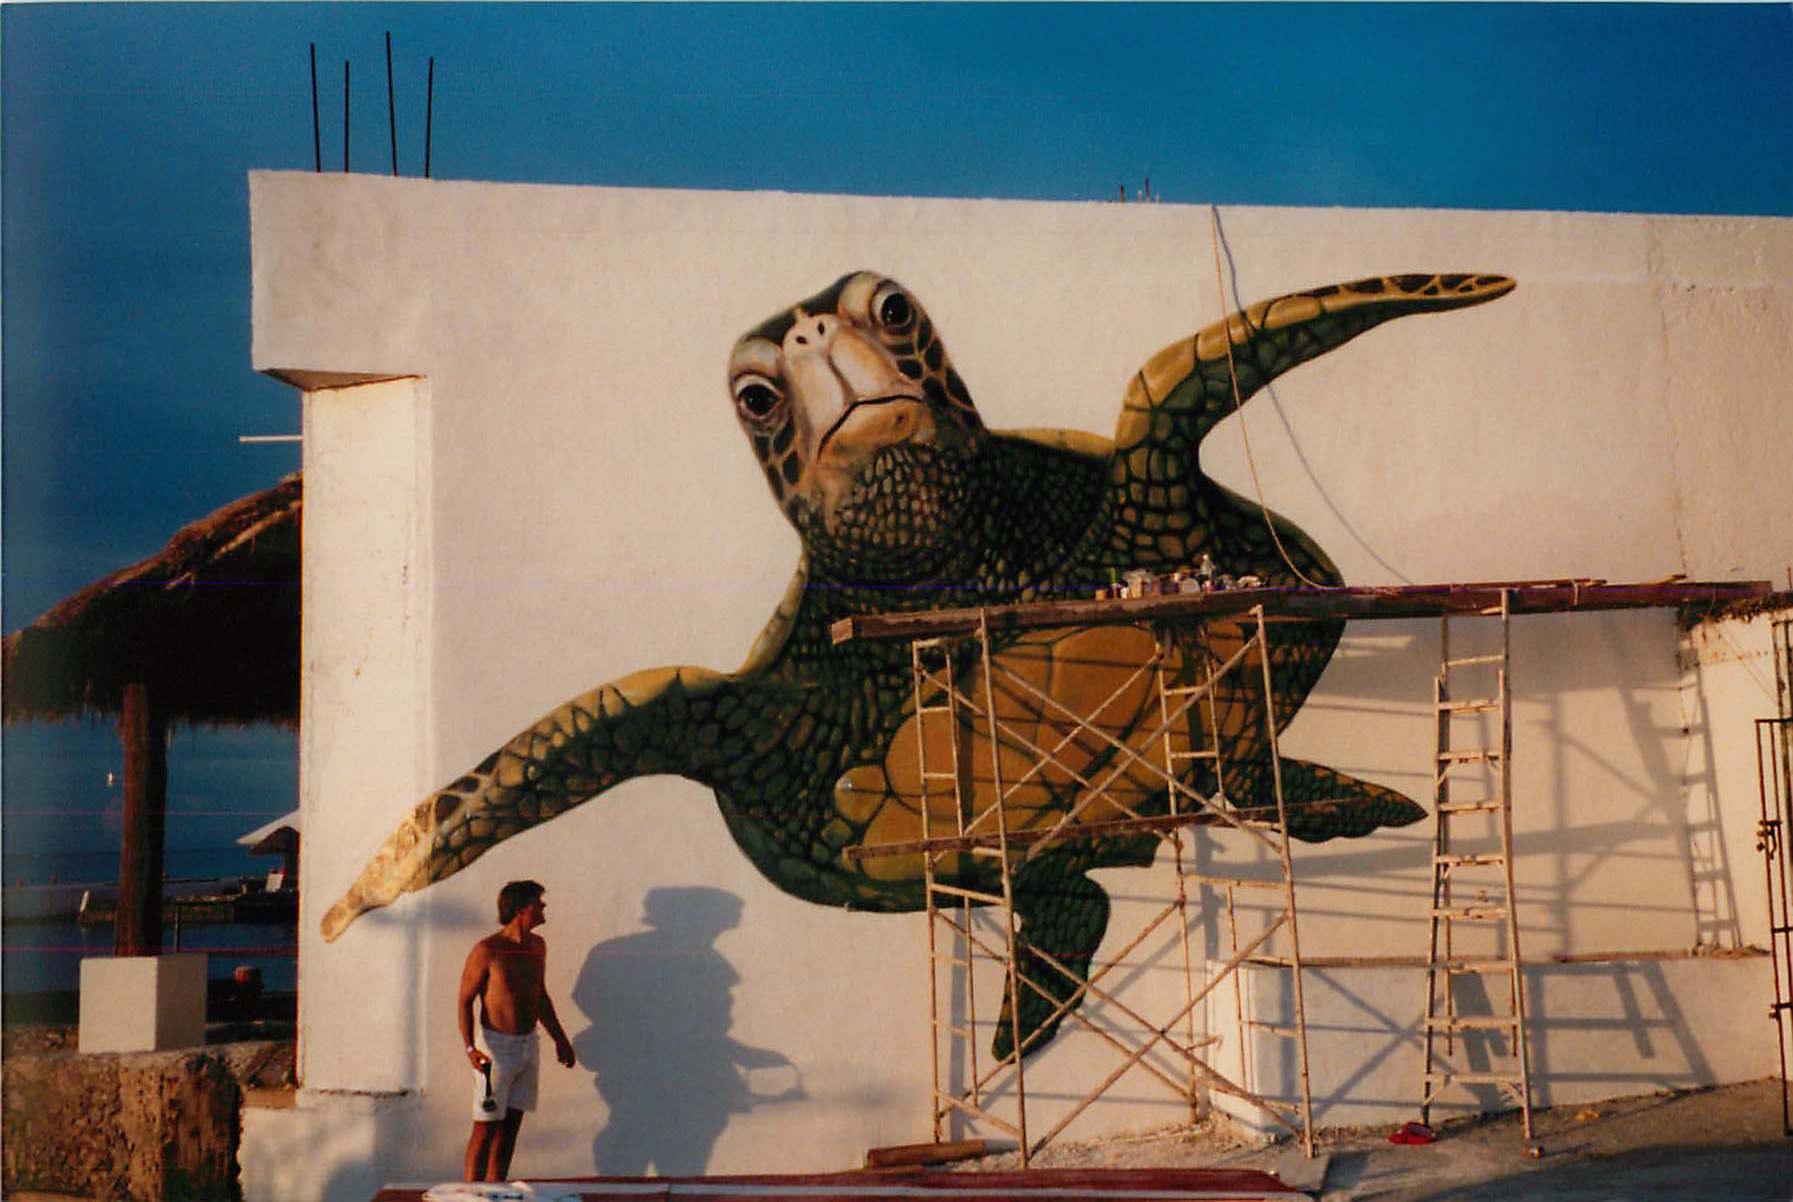 Coz.mural.09.jpg